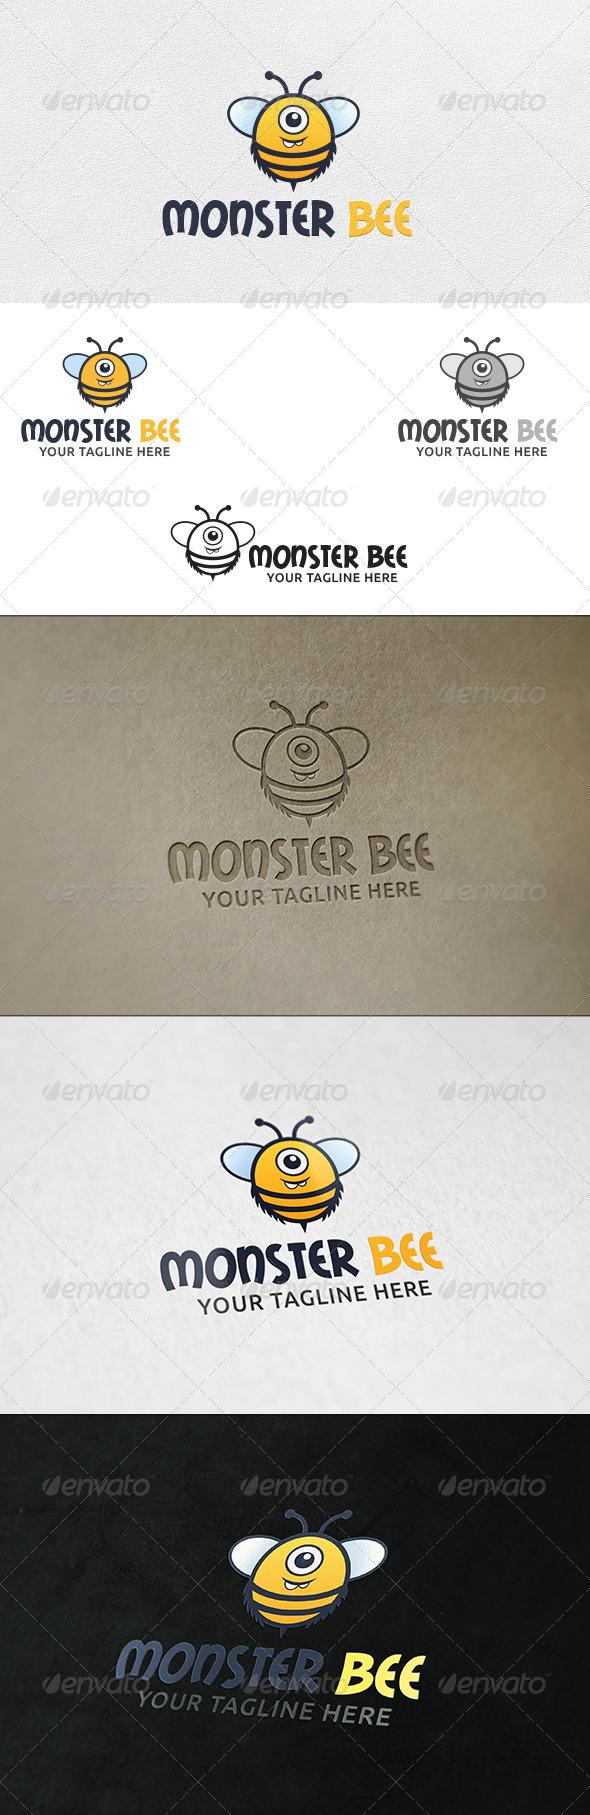 Monster Bee - Logo Template - Animals Logo Templates